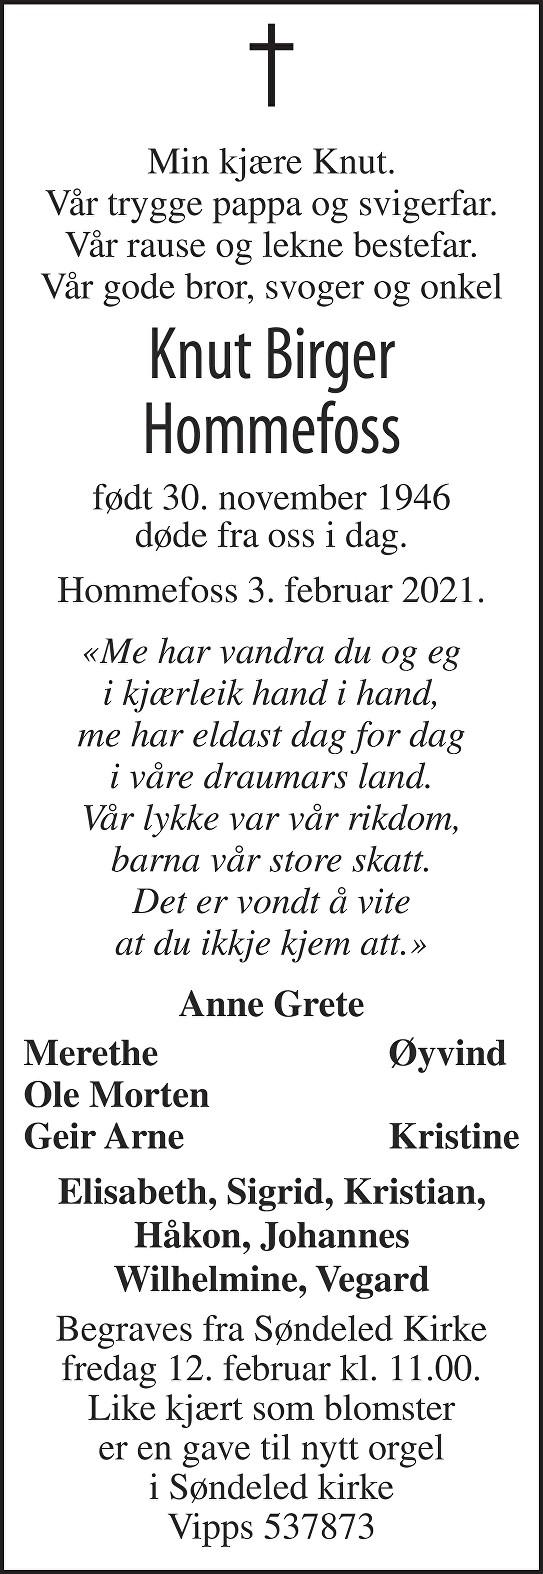 Knut Birger Hommefoss Dødsannonse